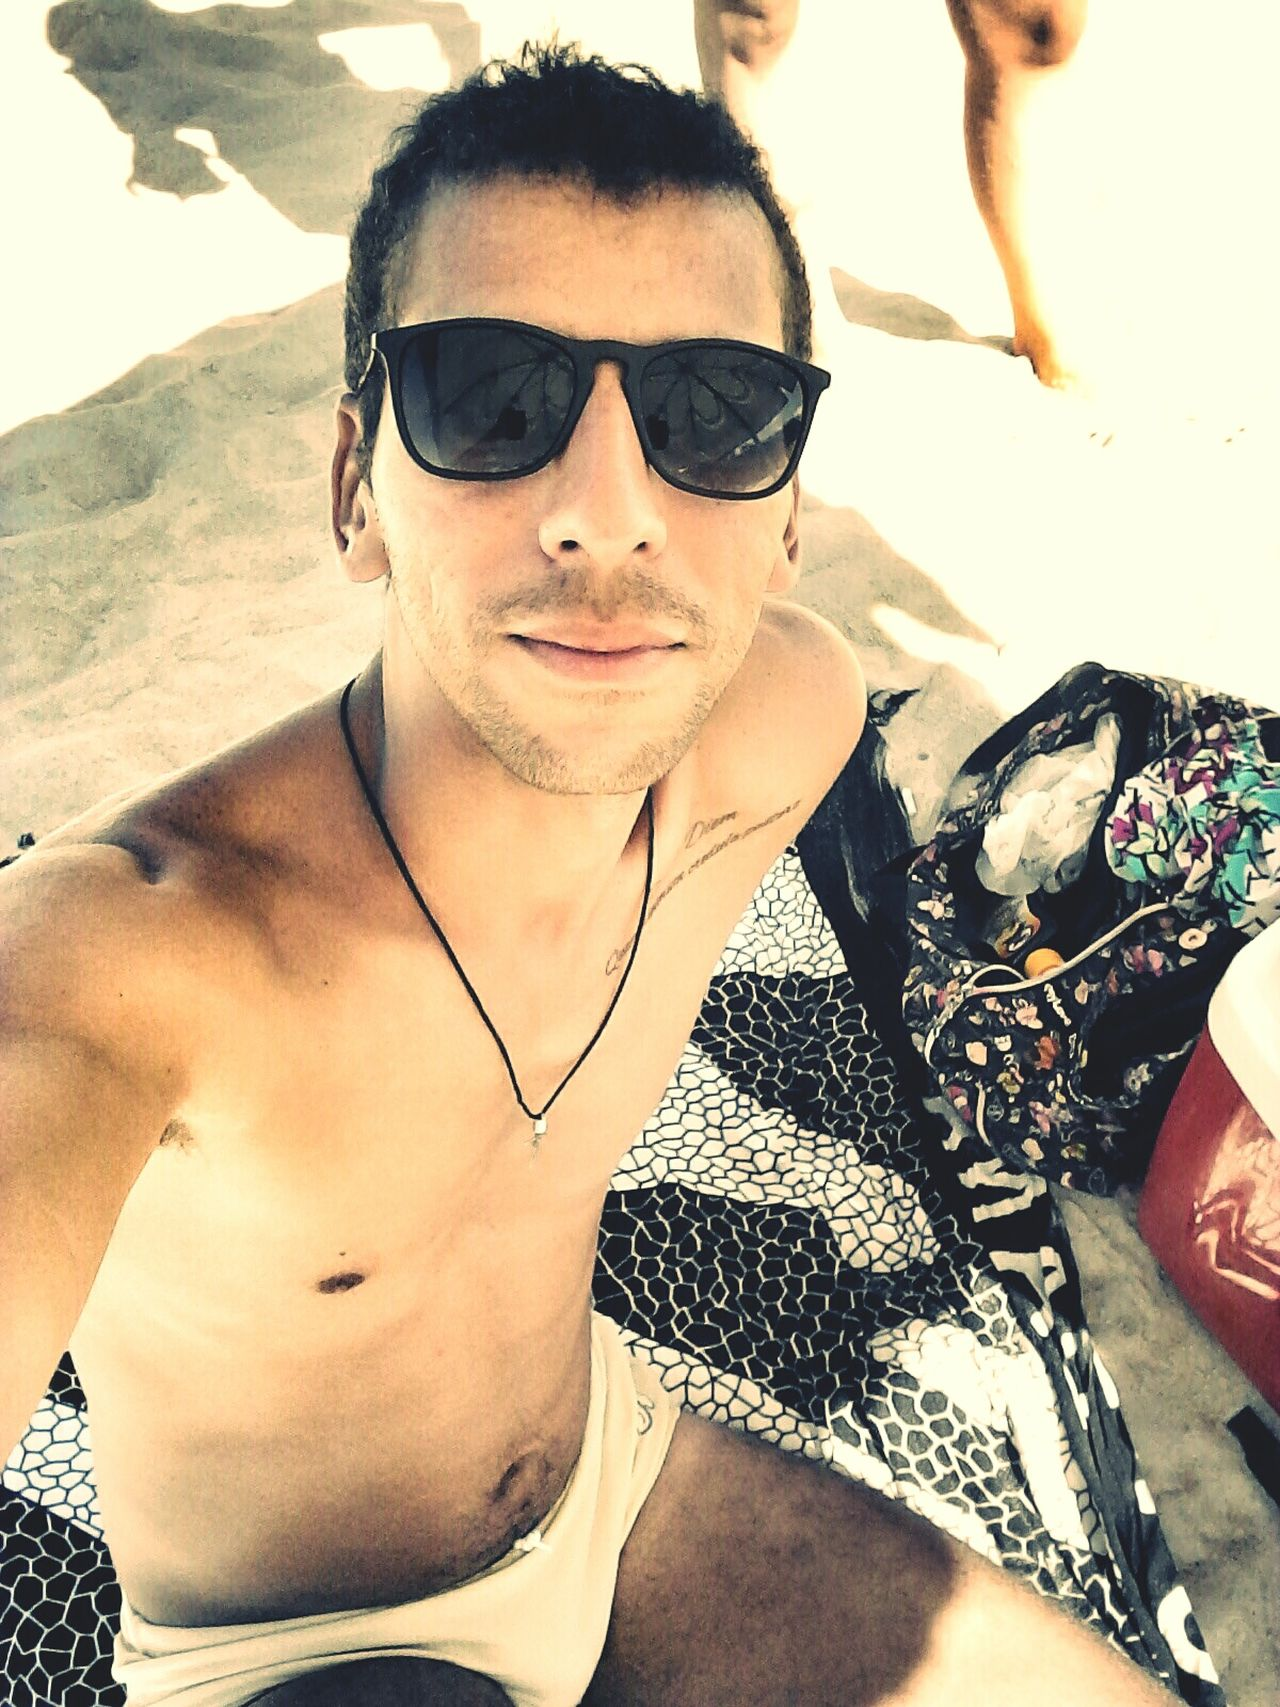 That's Me Hi! Cheese! Enjoying Life Relaxing Taking Photos Sexyguy Sexyman Sexyboy Gayboy Guy Gaysexy Lookatme Beachphotography Brasilianboy Florianópolis Mylife BeHappy♡ Summer Gaylife Prettyday  Campeche Beach Day